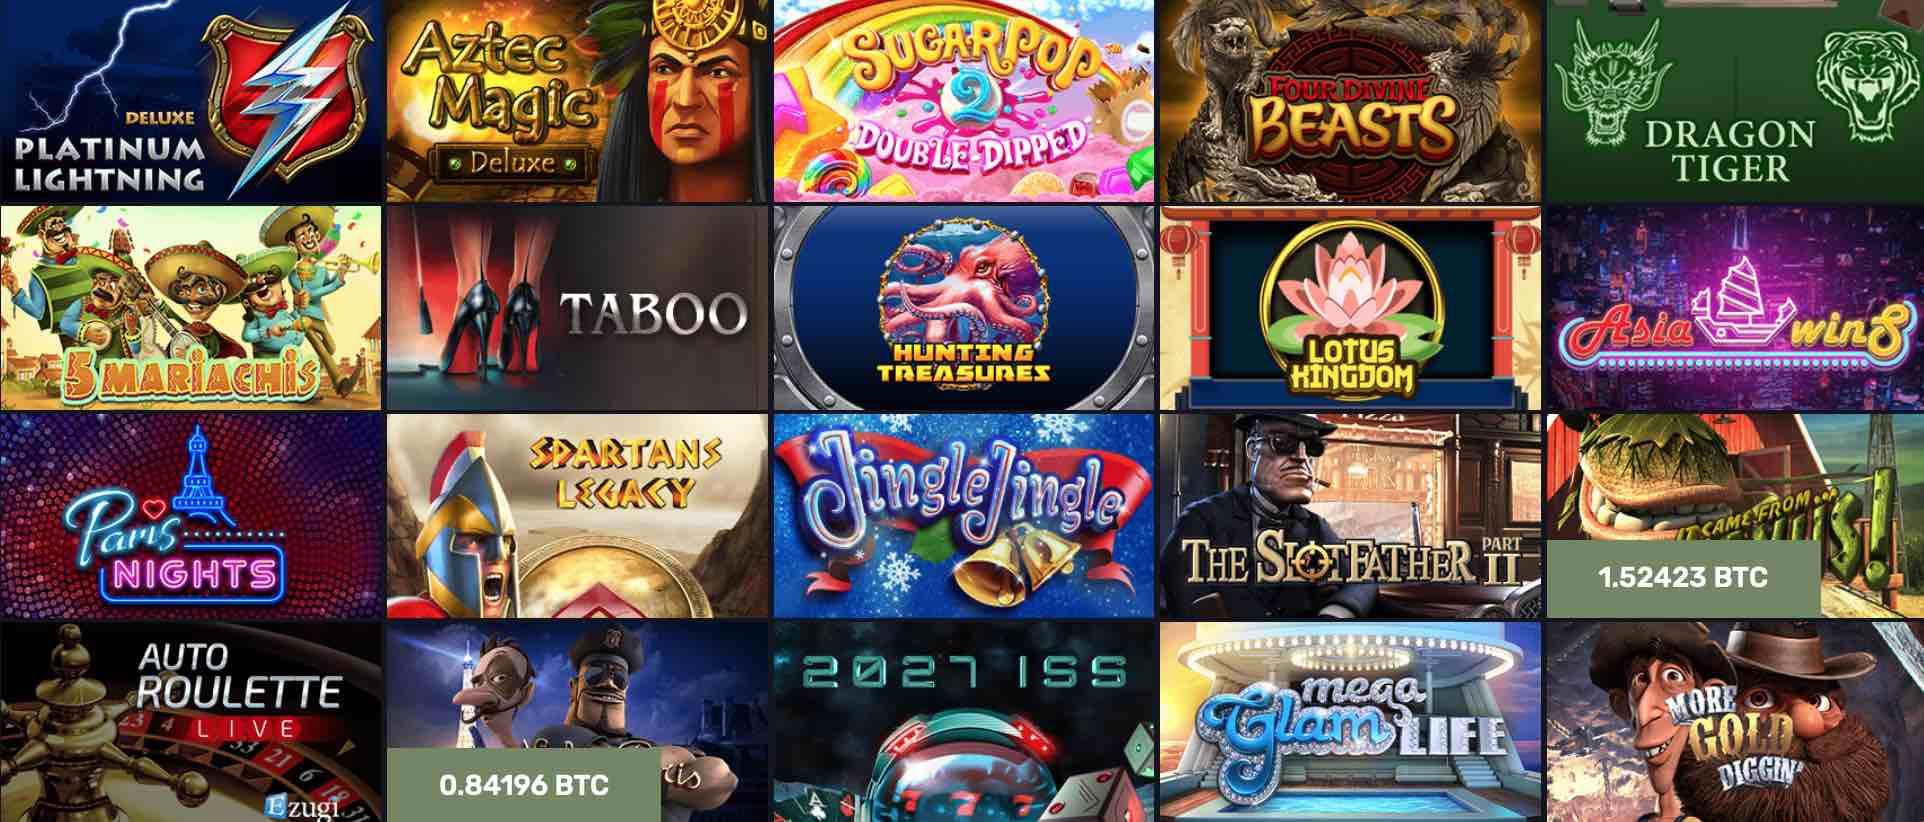 Single deck blackjack strategy wizard odds